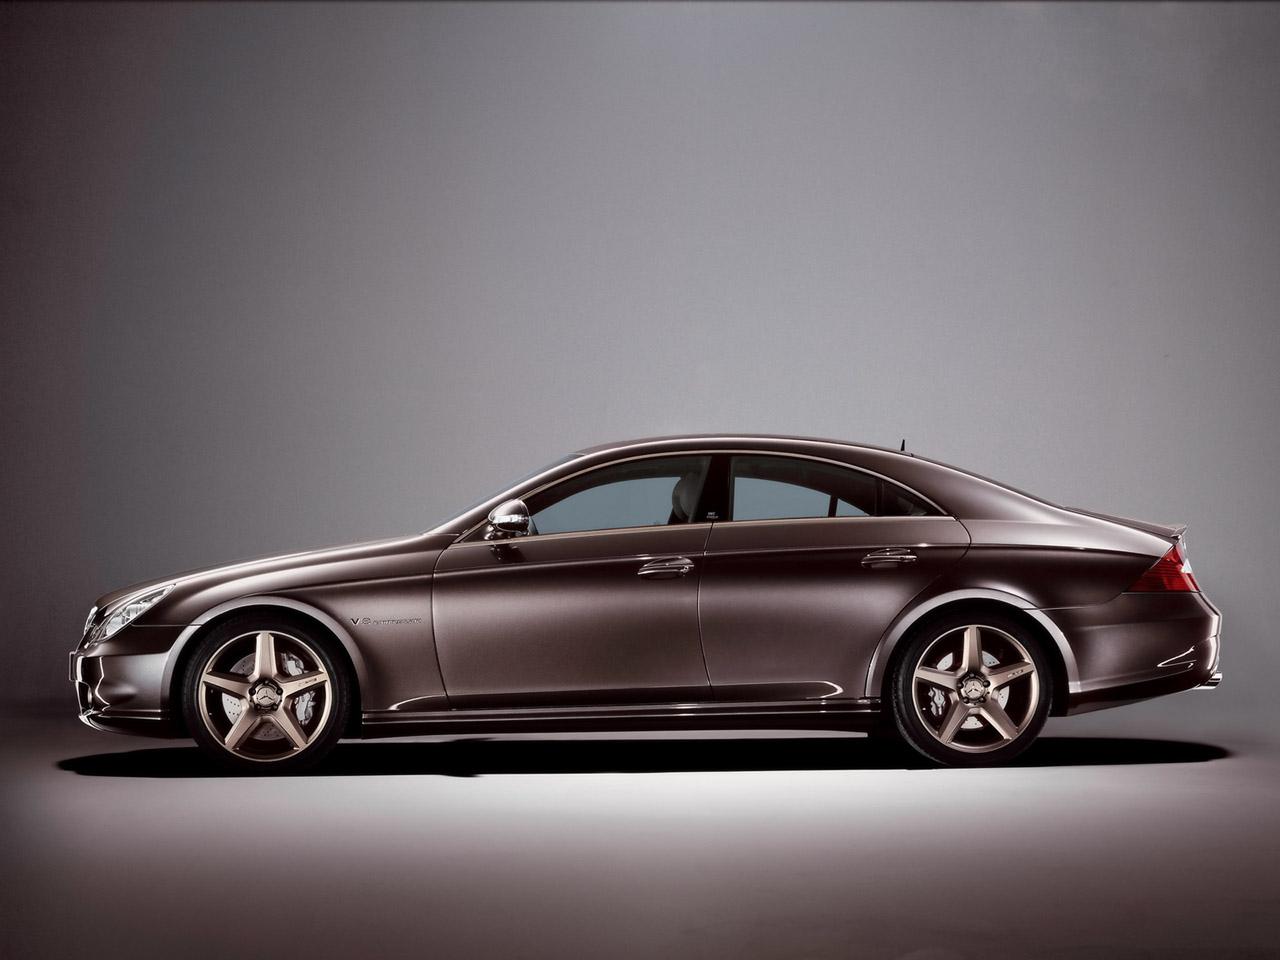 Mercedes benz cls history photos on better parts ltd for Mercedes benz cls series